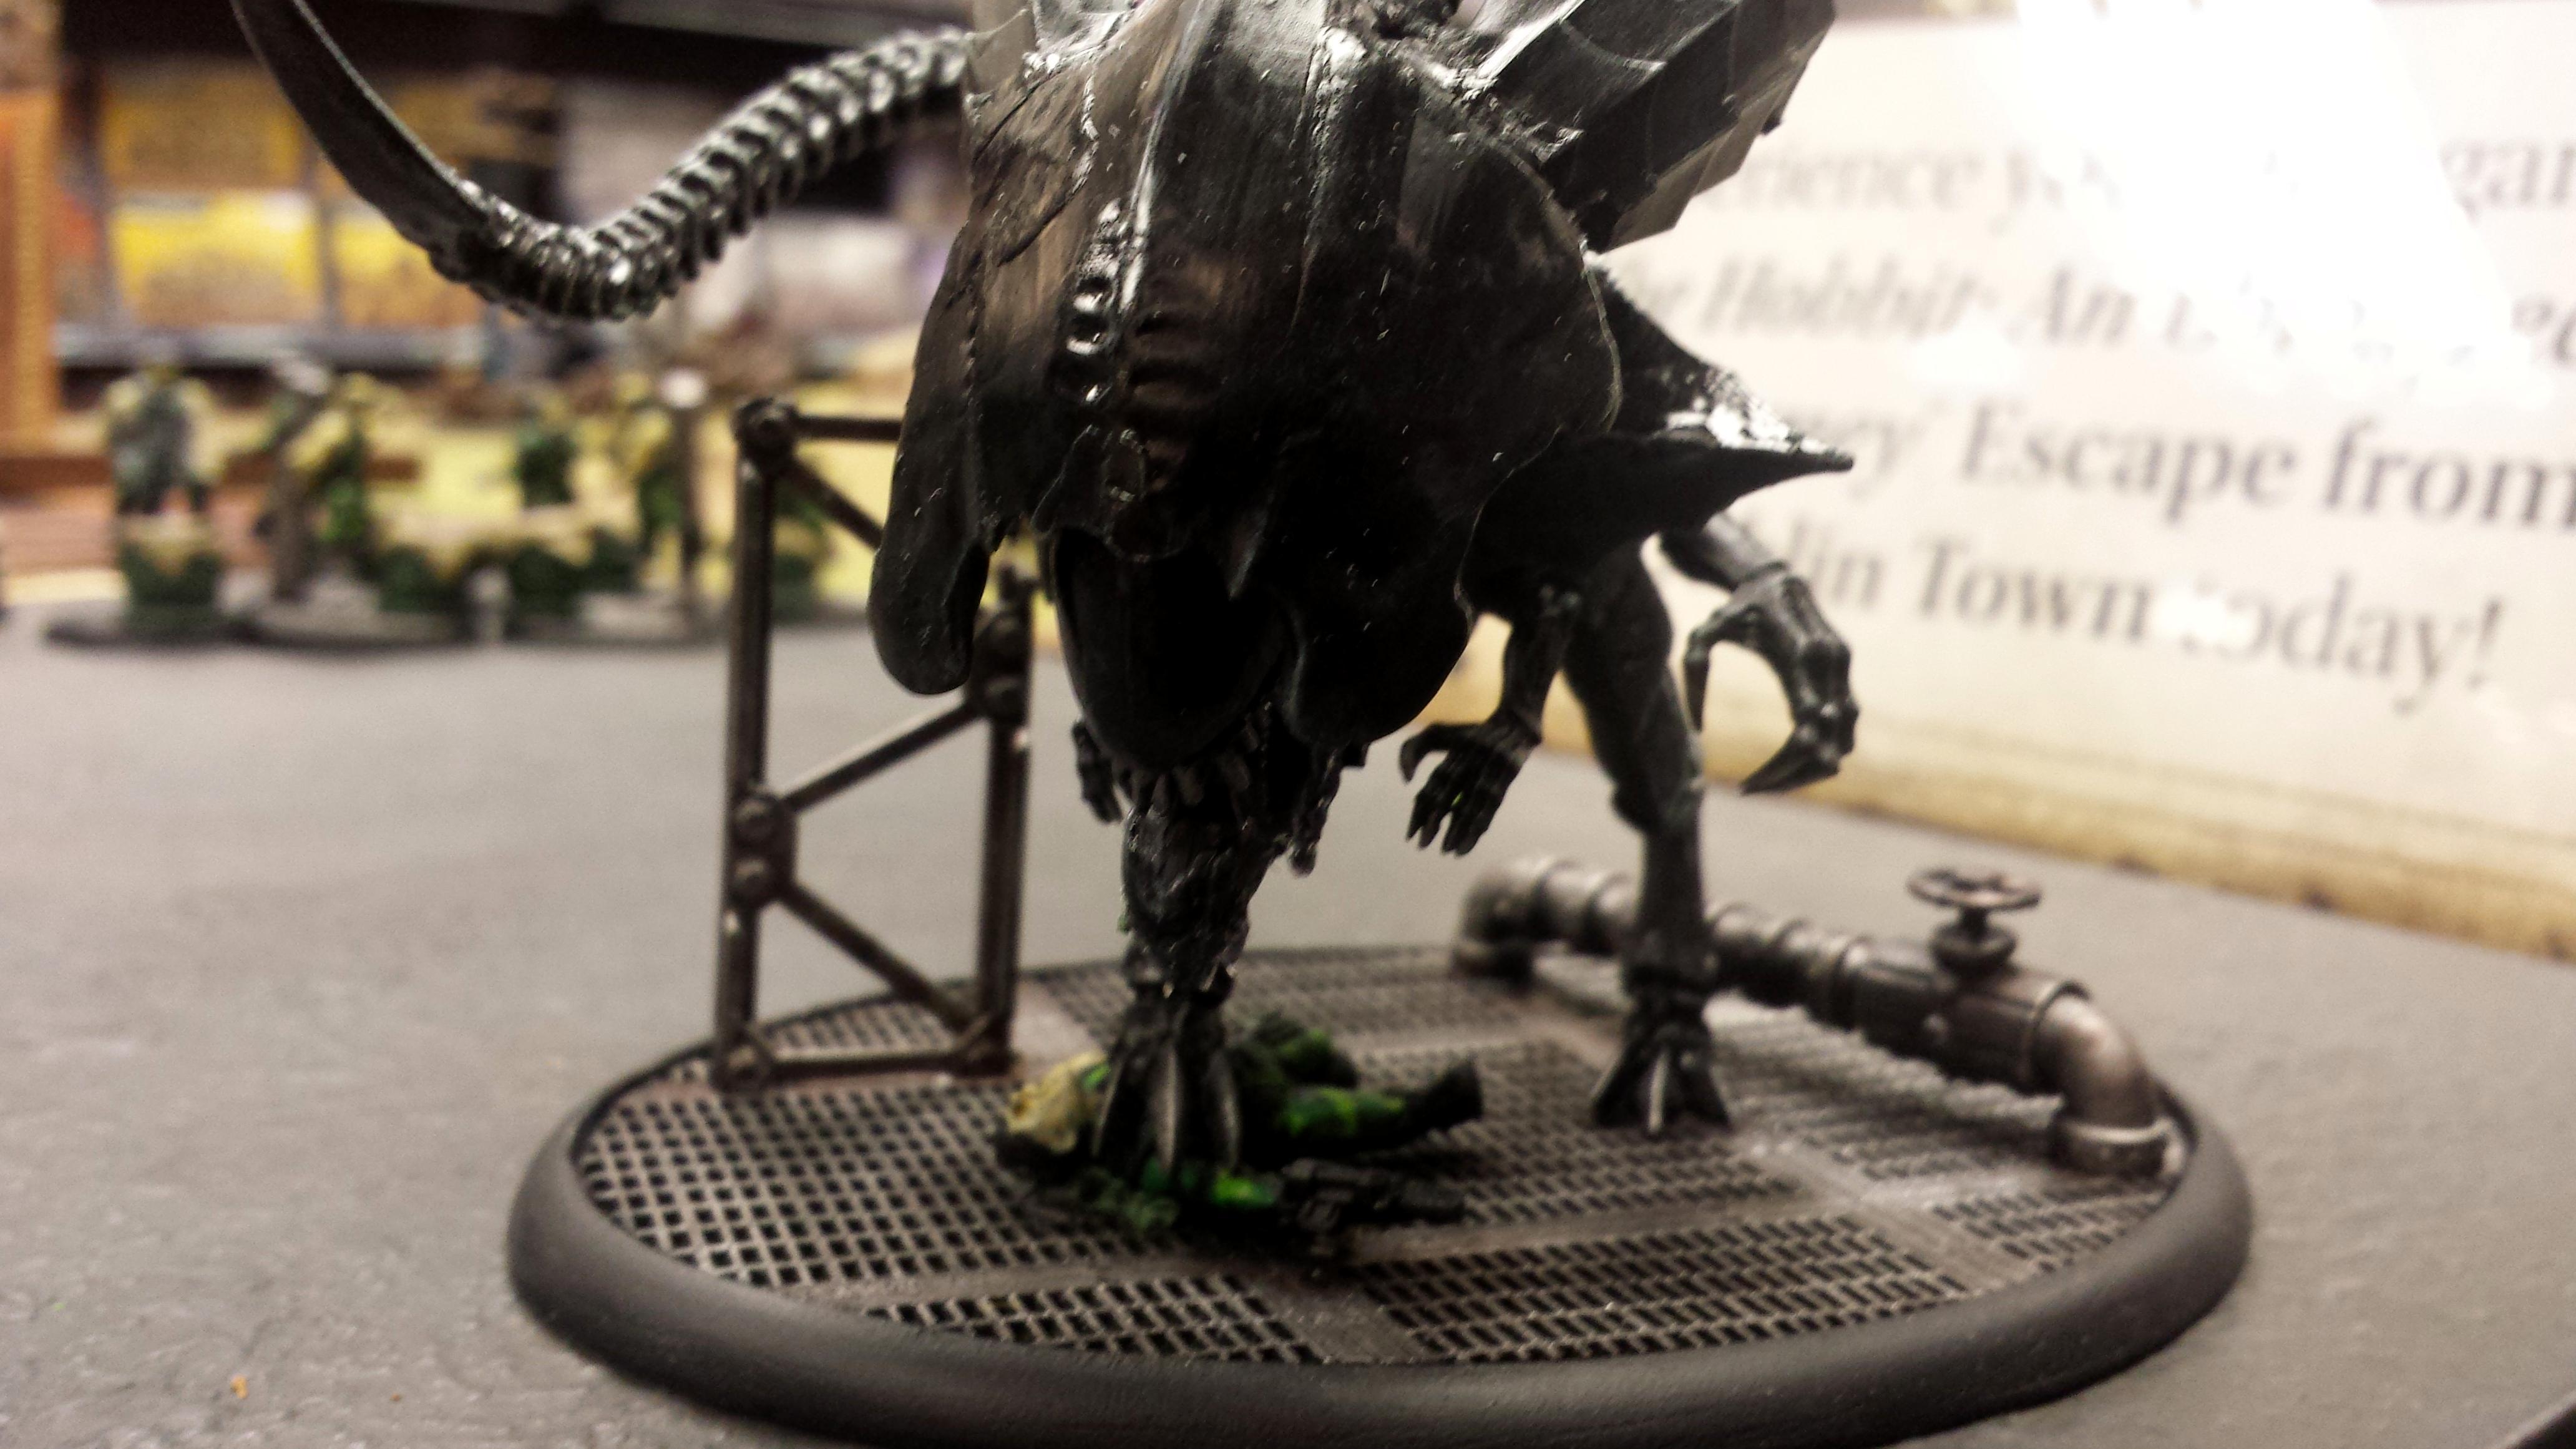 Alien, Aliens, Deathleaper, Doom Of Malantai, Genestealer, Hive Fleet, Hive Tyrant, Mycetic Spore, Spore Mine Clusters, Swarmlord, Tyranids, Warhammer 40,000, Warriors, Ymgarl Genestealers